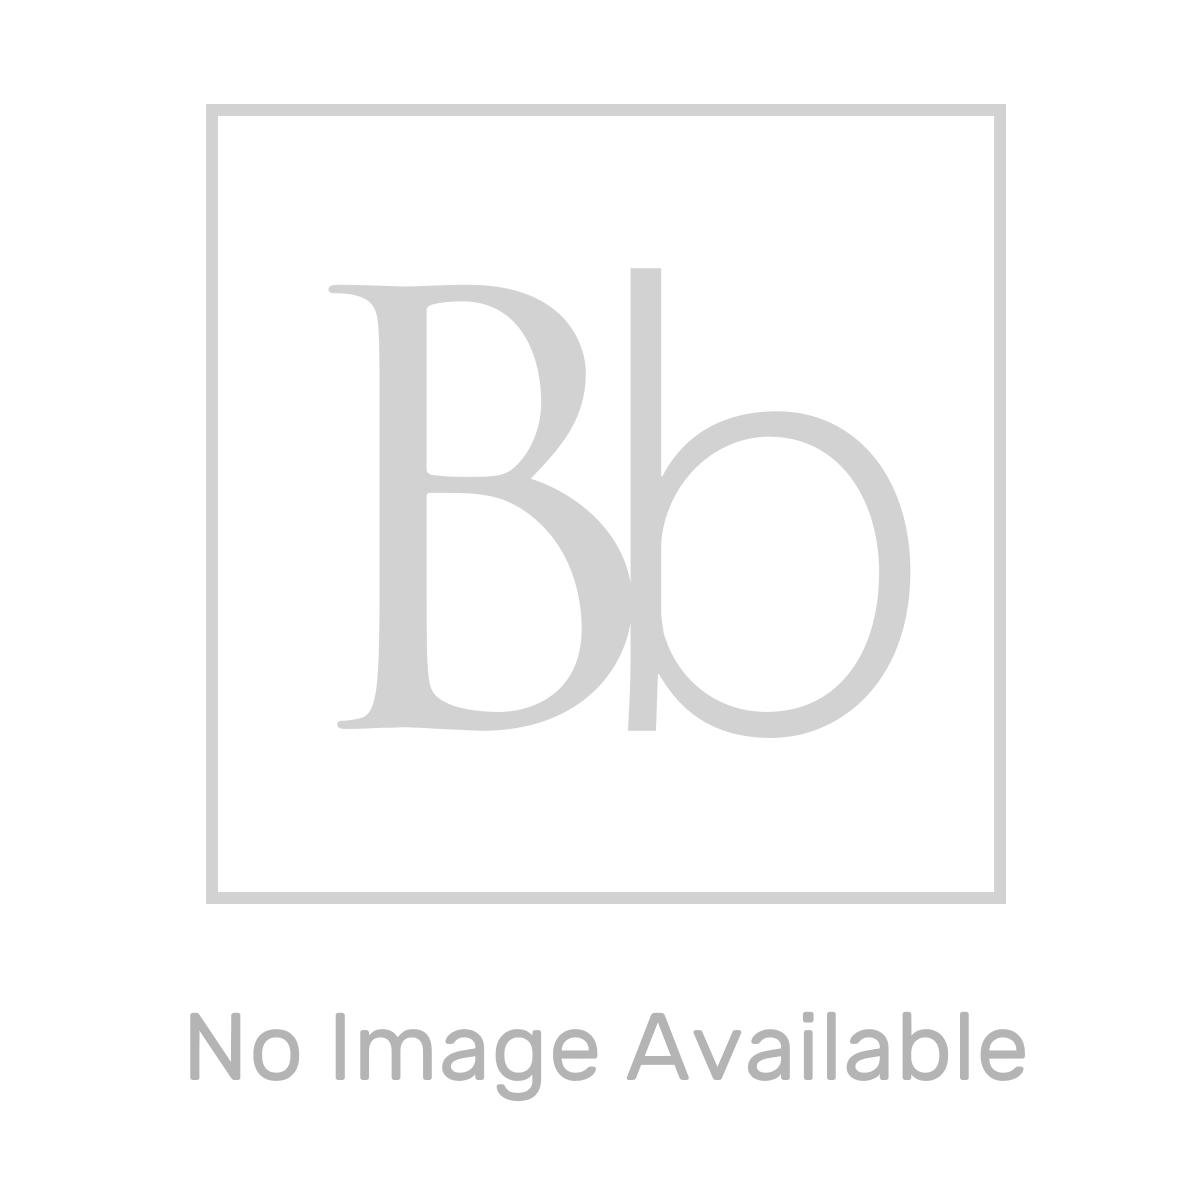 RAK Summit Close Coupled Toilet Measurements